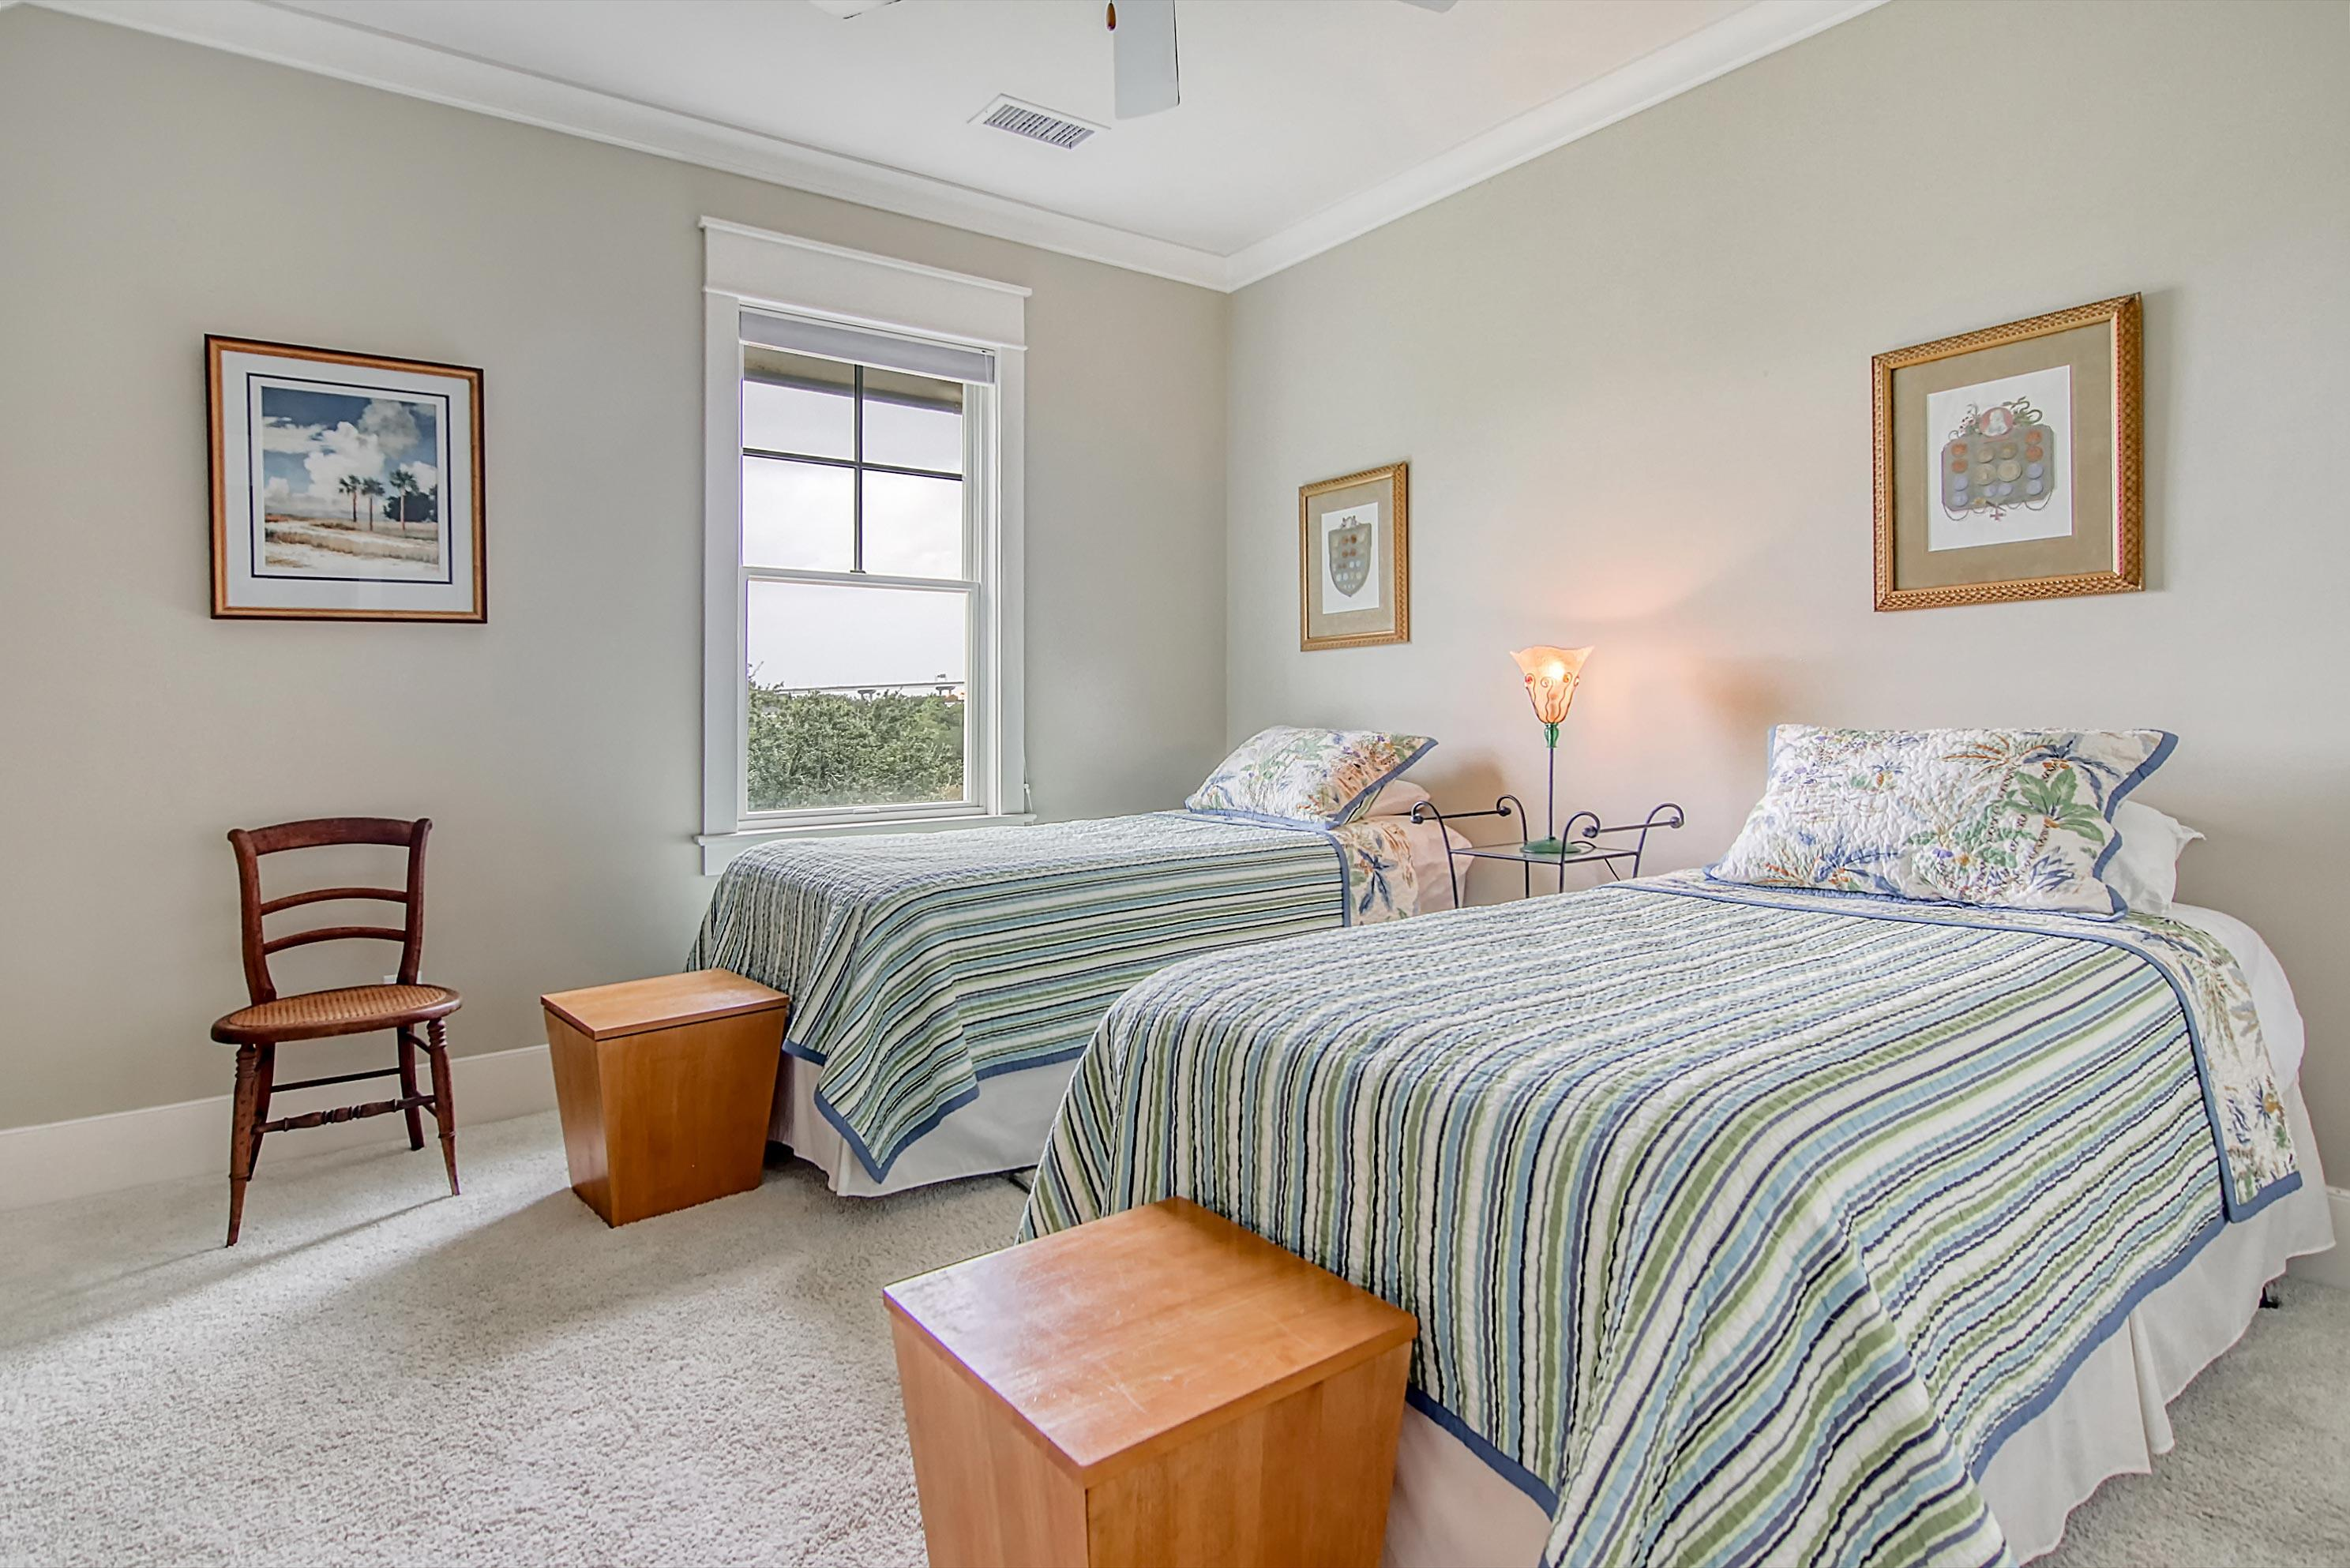 Scanlonville Homes For Sale - 152 6th, Mount Pleasant, SC - 79